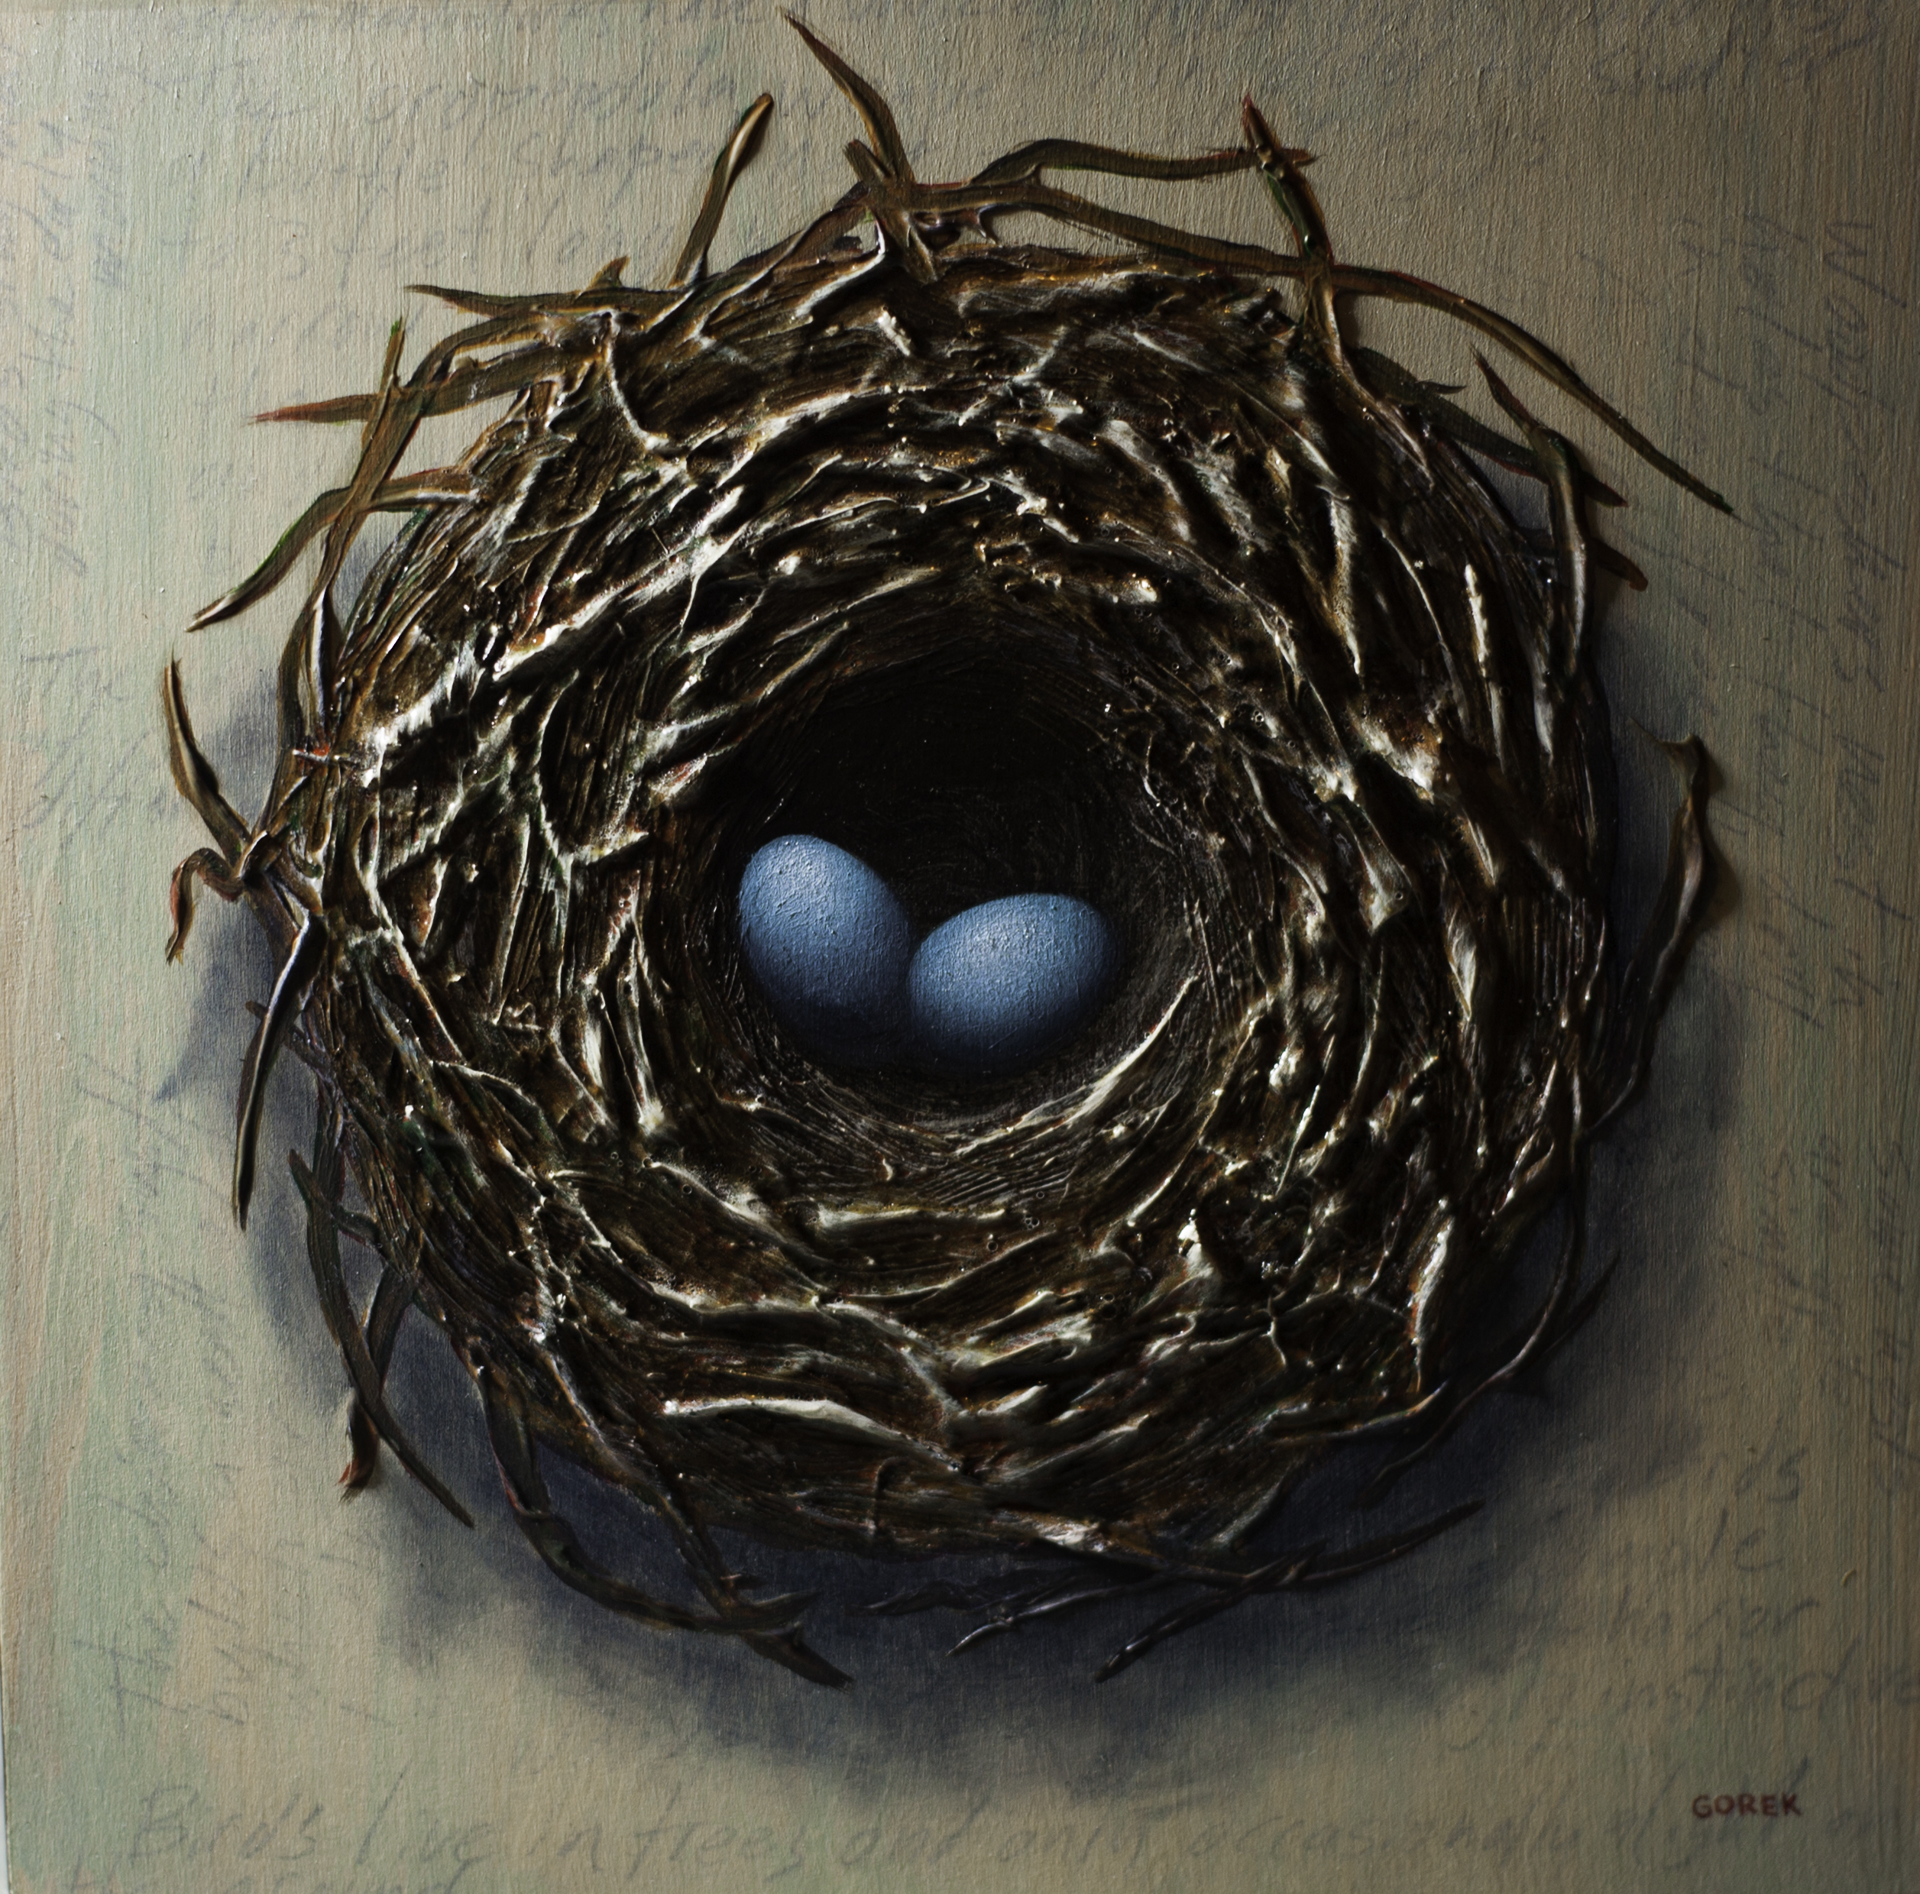 Bird's Nest, Two Eggs by Thane Gorek